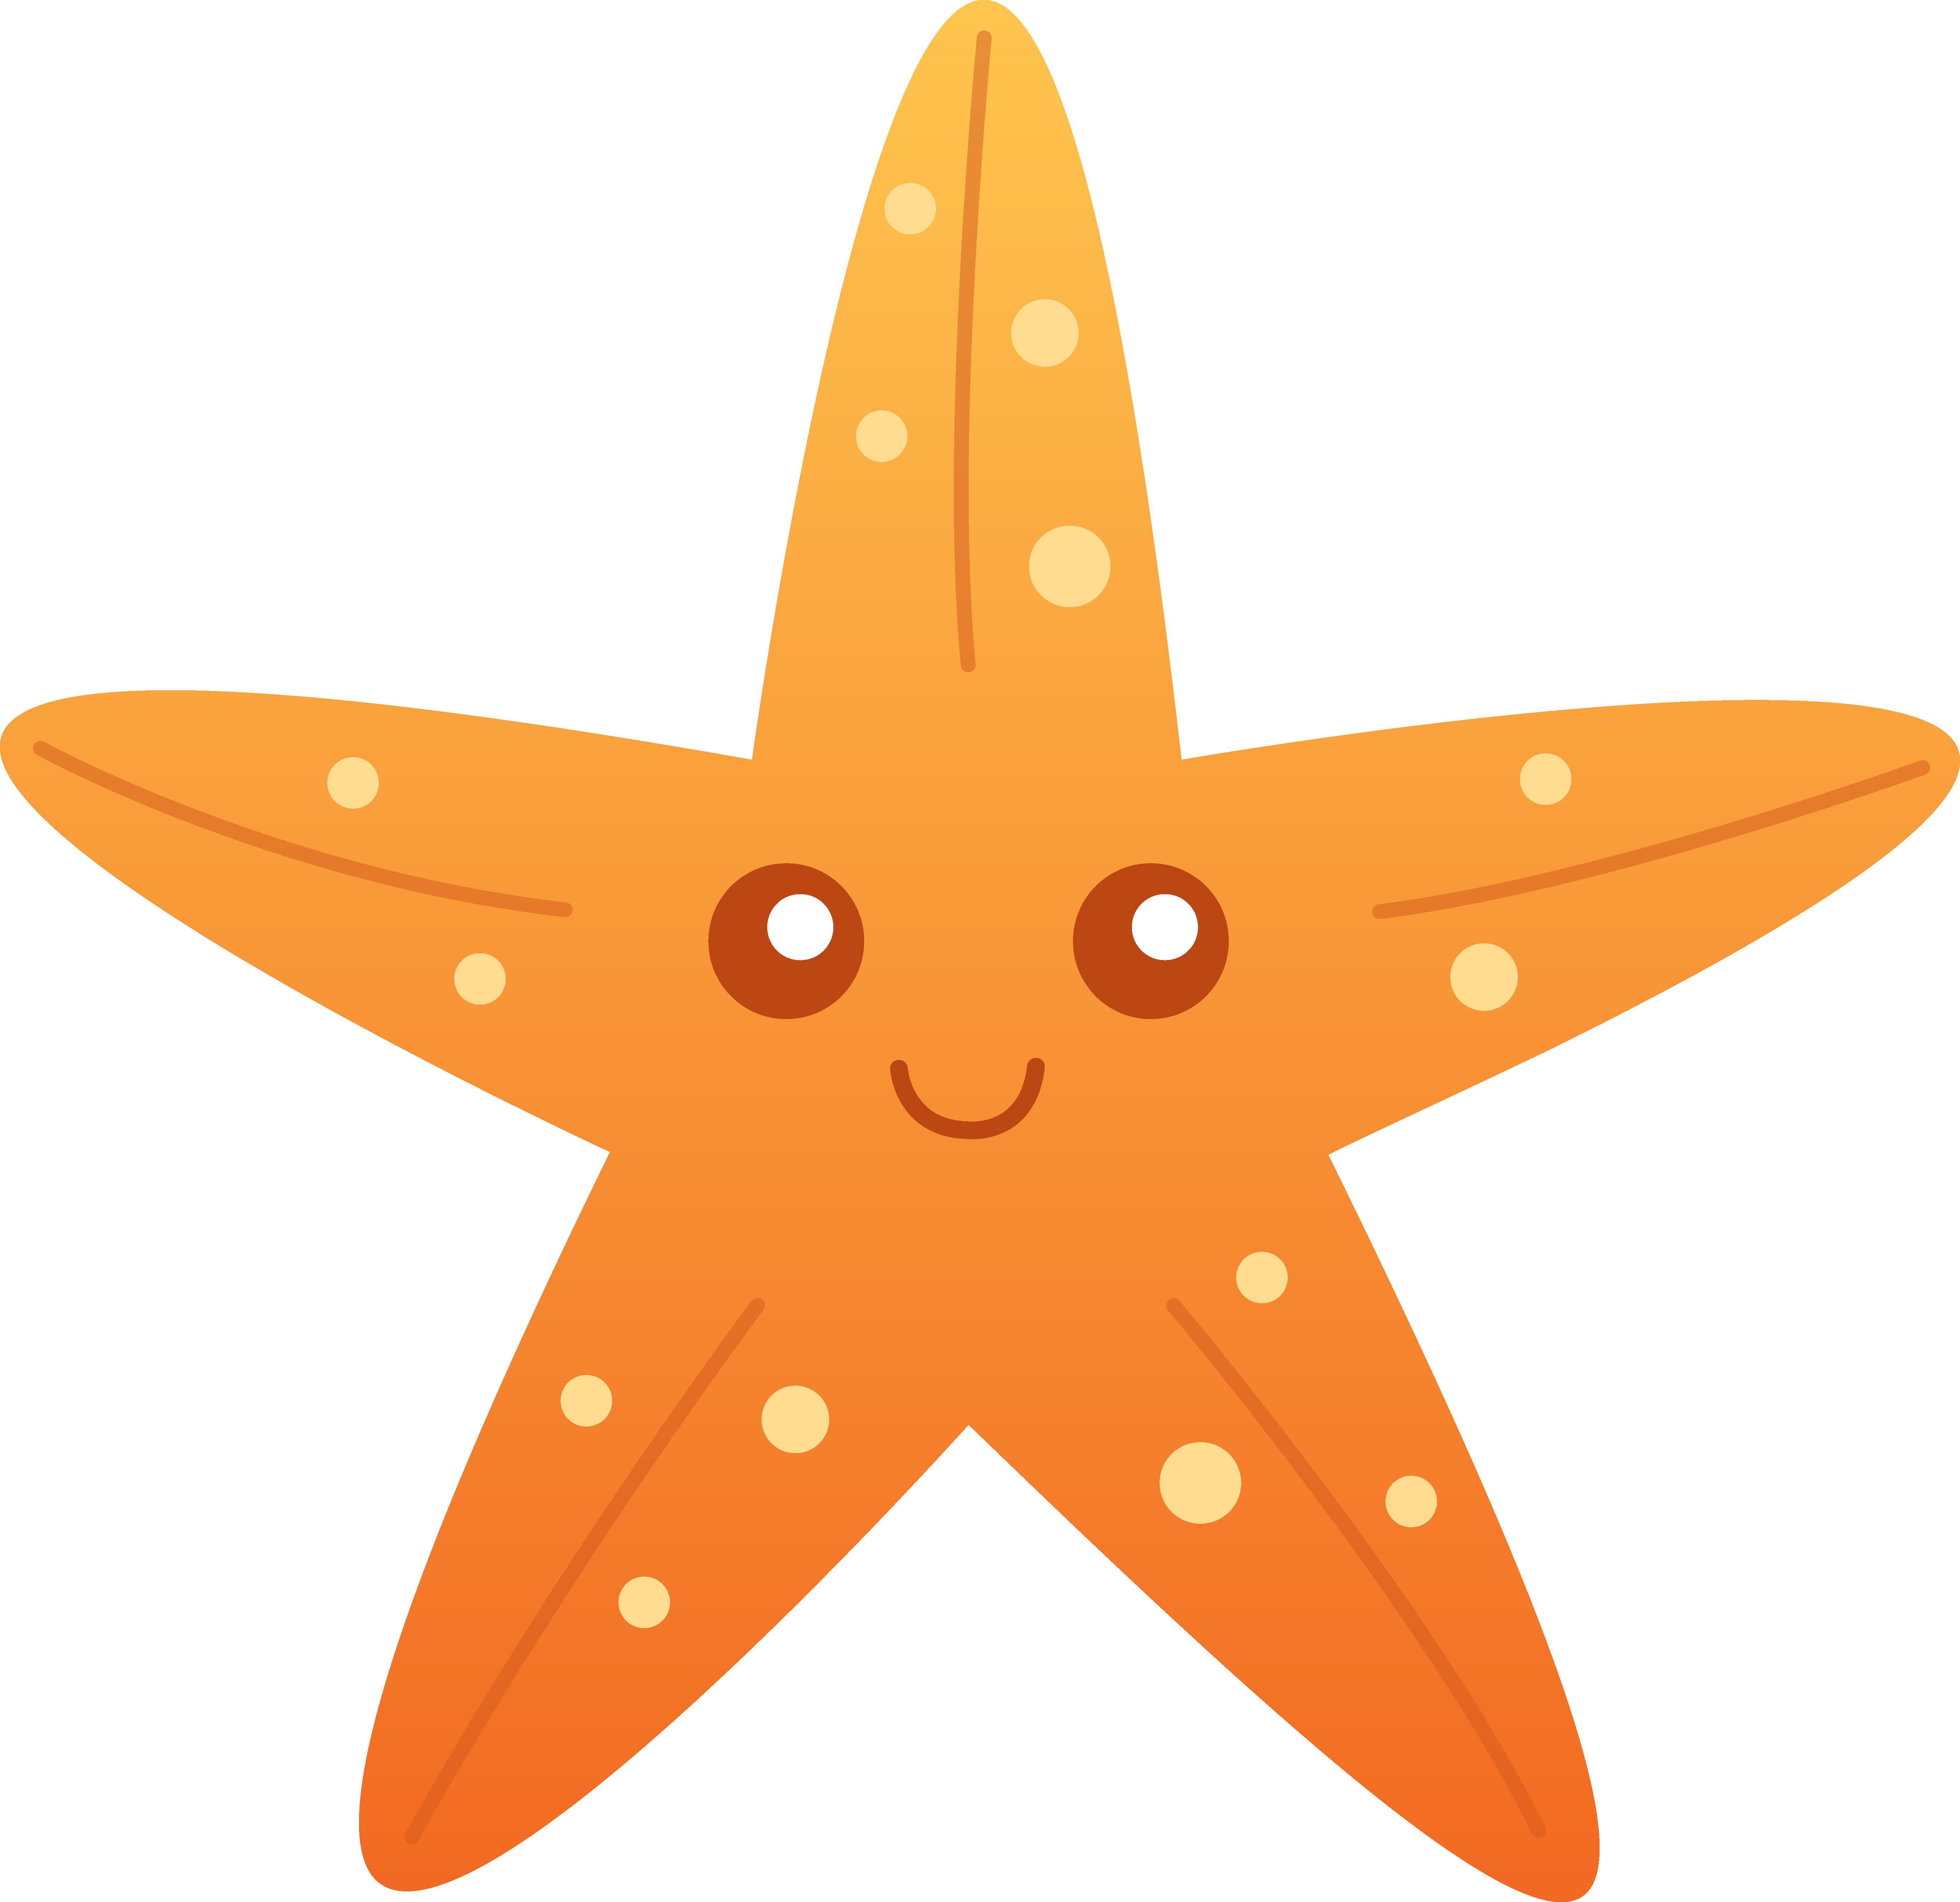 Peach clipart cute. Starfish panda free images